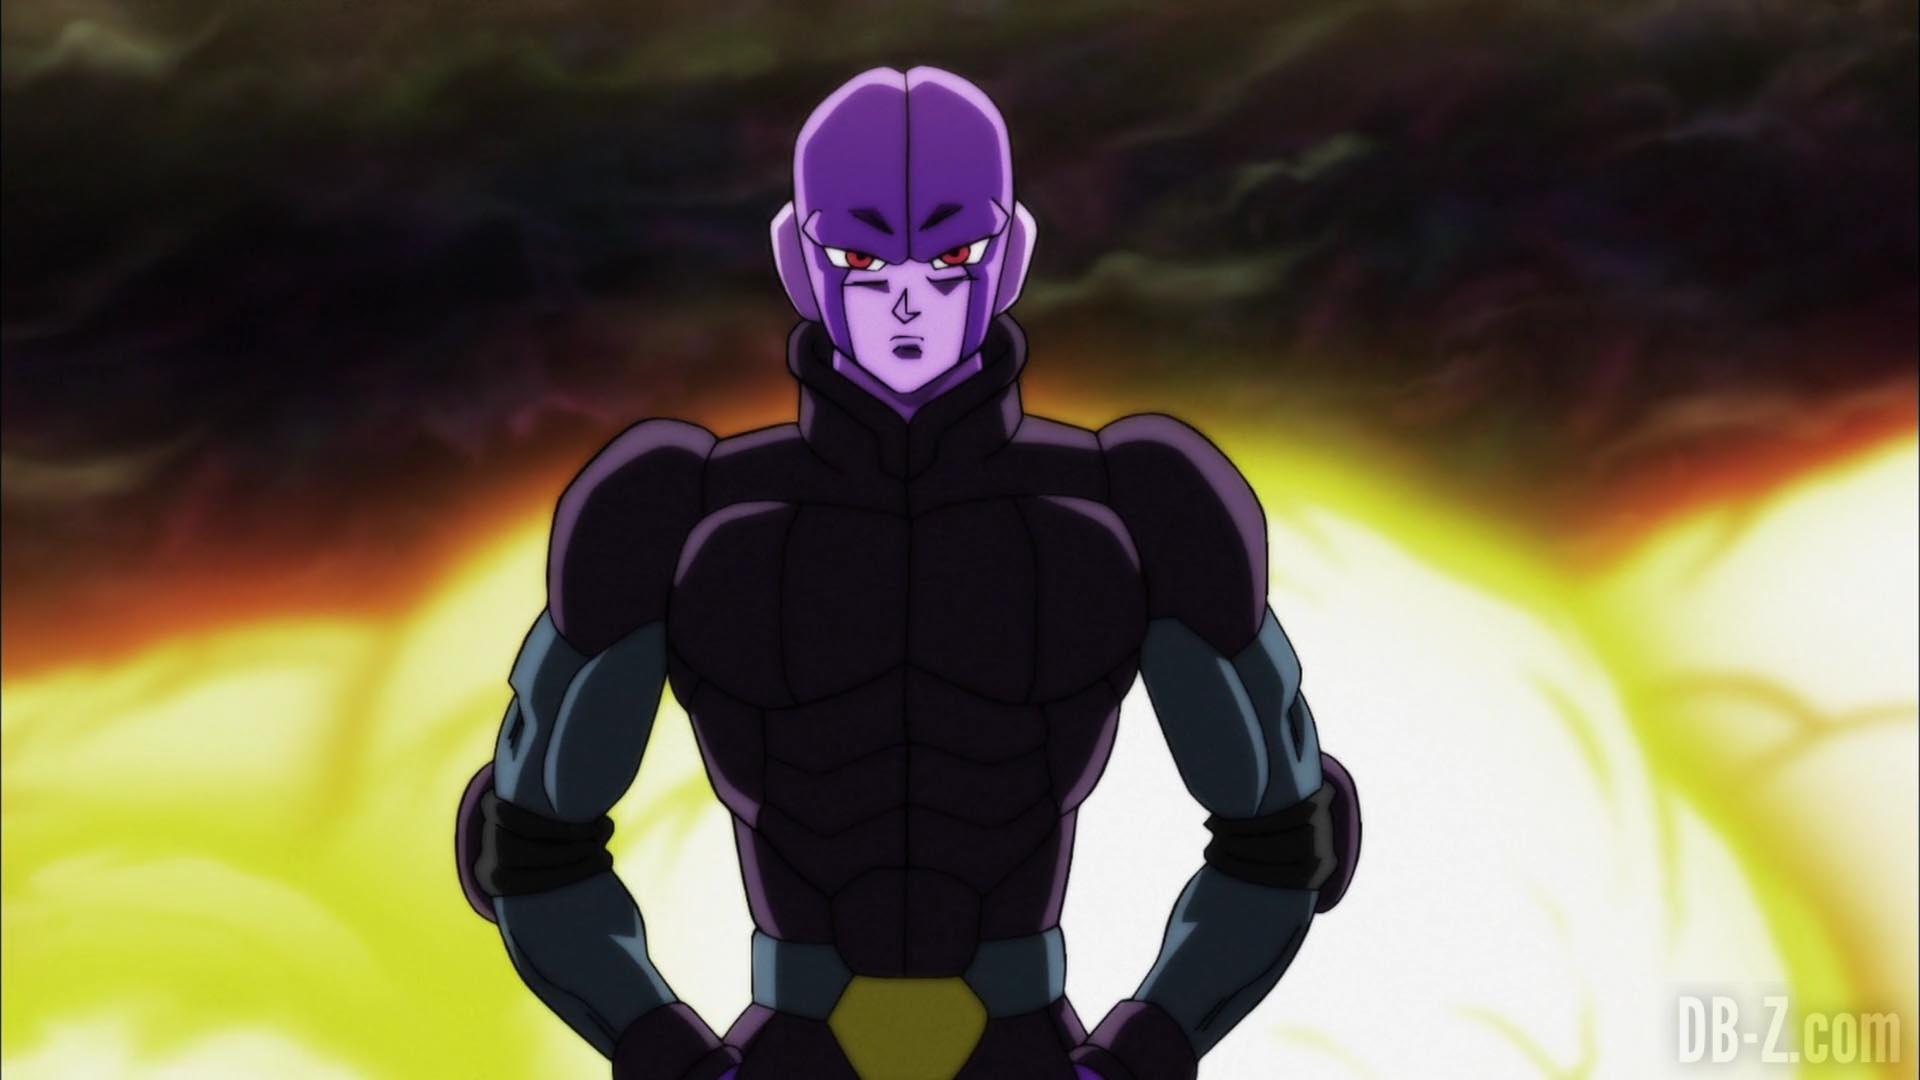 Dragon-Ball-Super-Episode-99-22.jpg